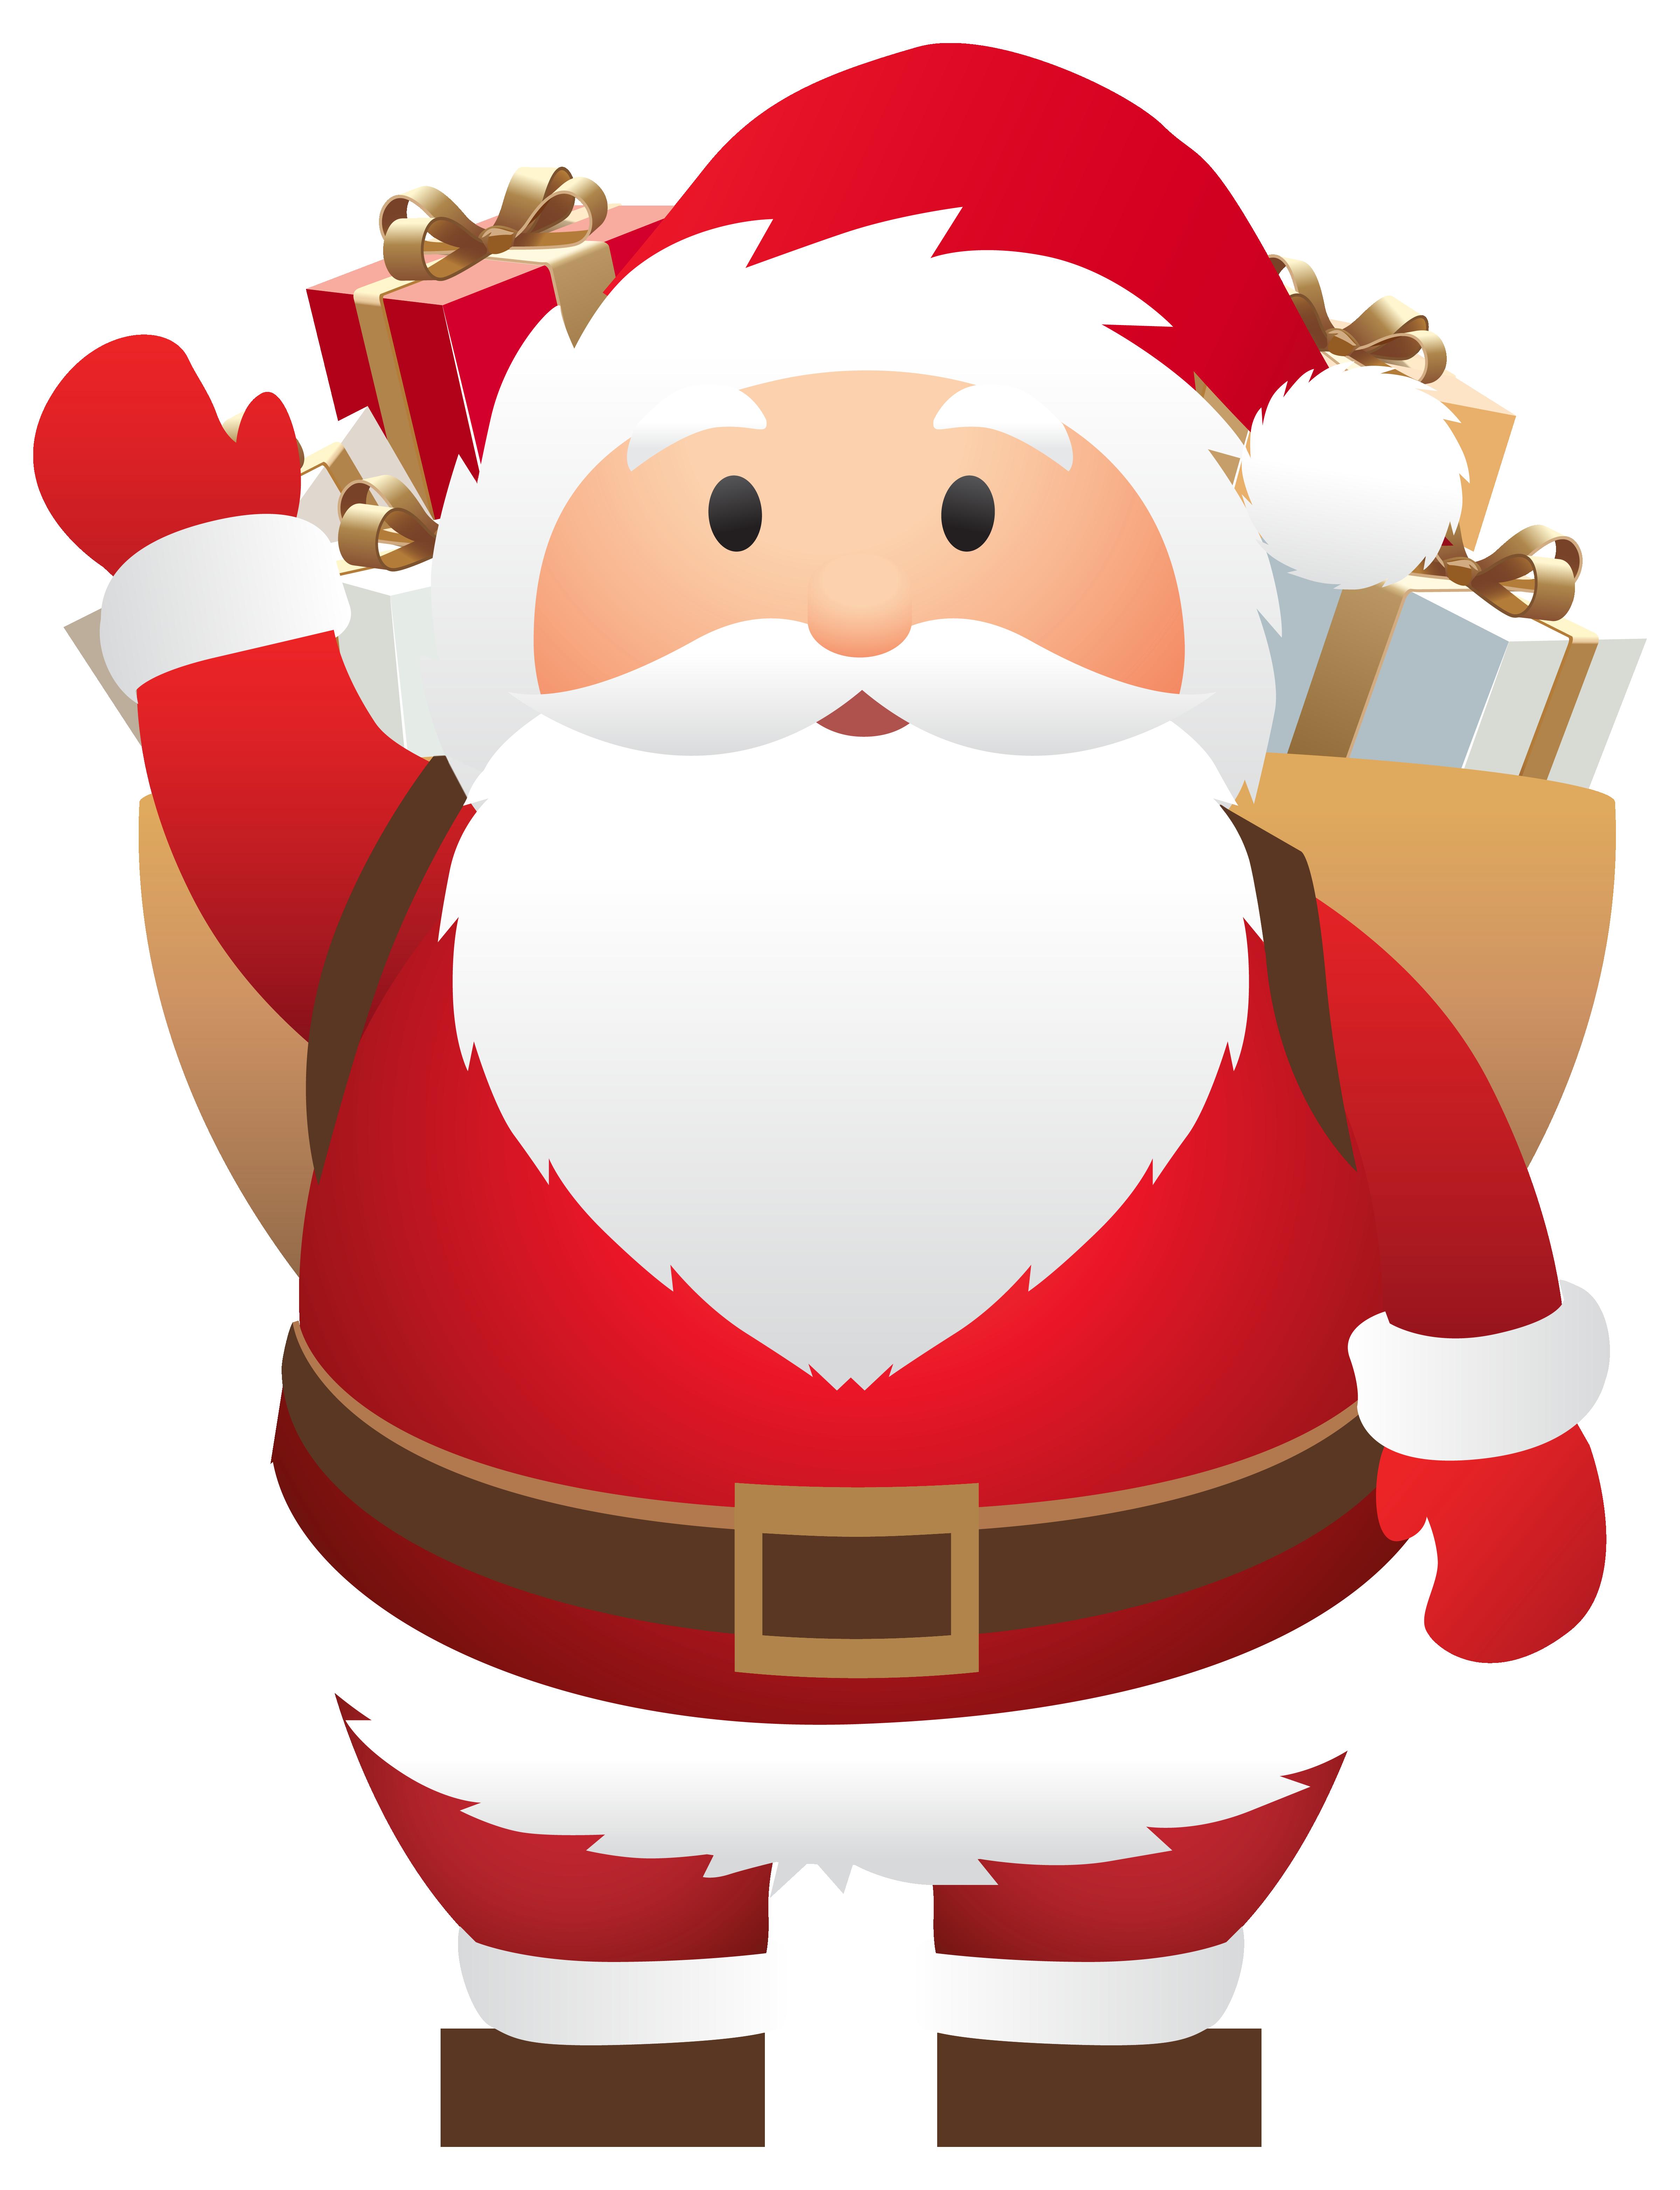 Decoration clipart cute. Santa claus christmas clip